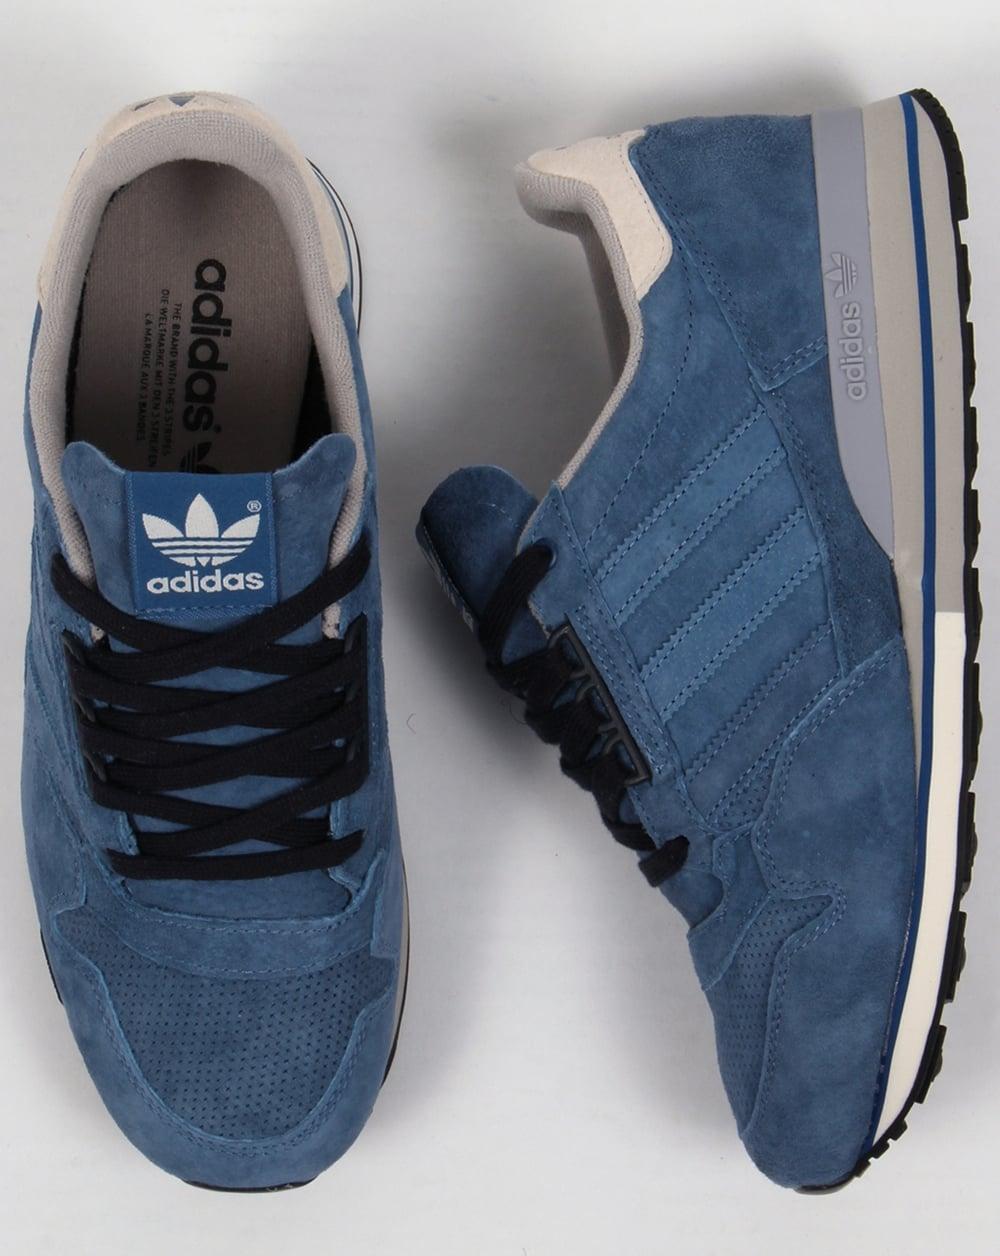 Adidas Zx 500 Azul E4iKYQi